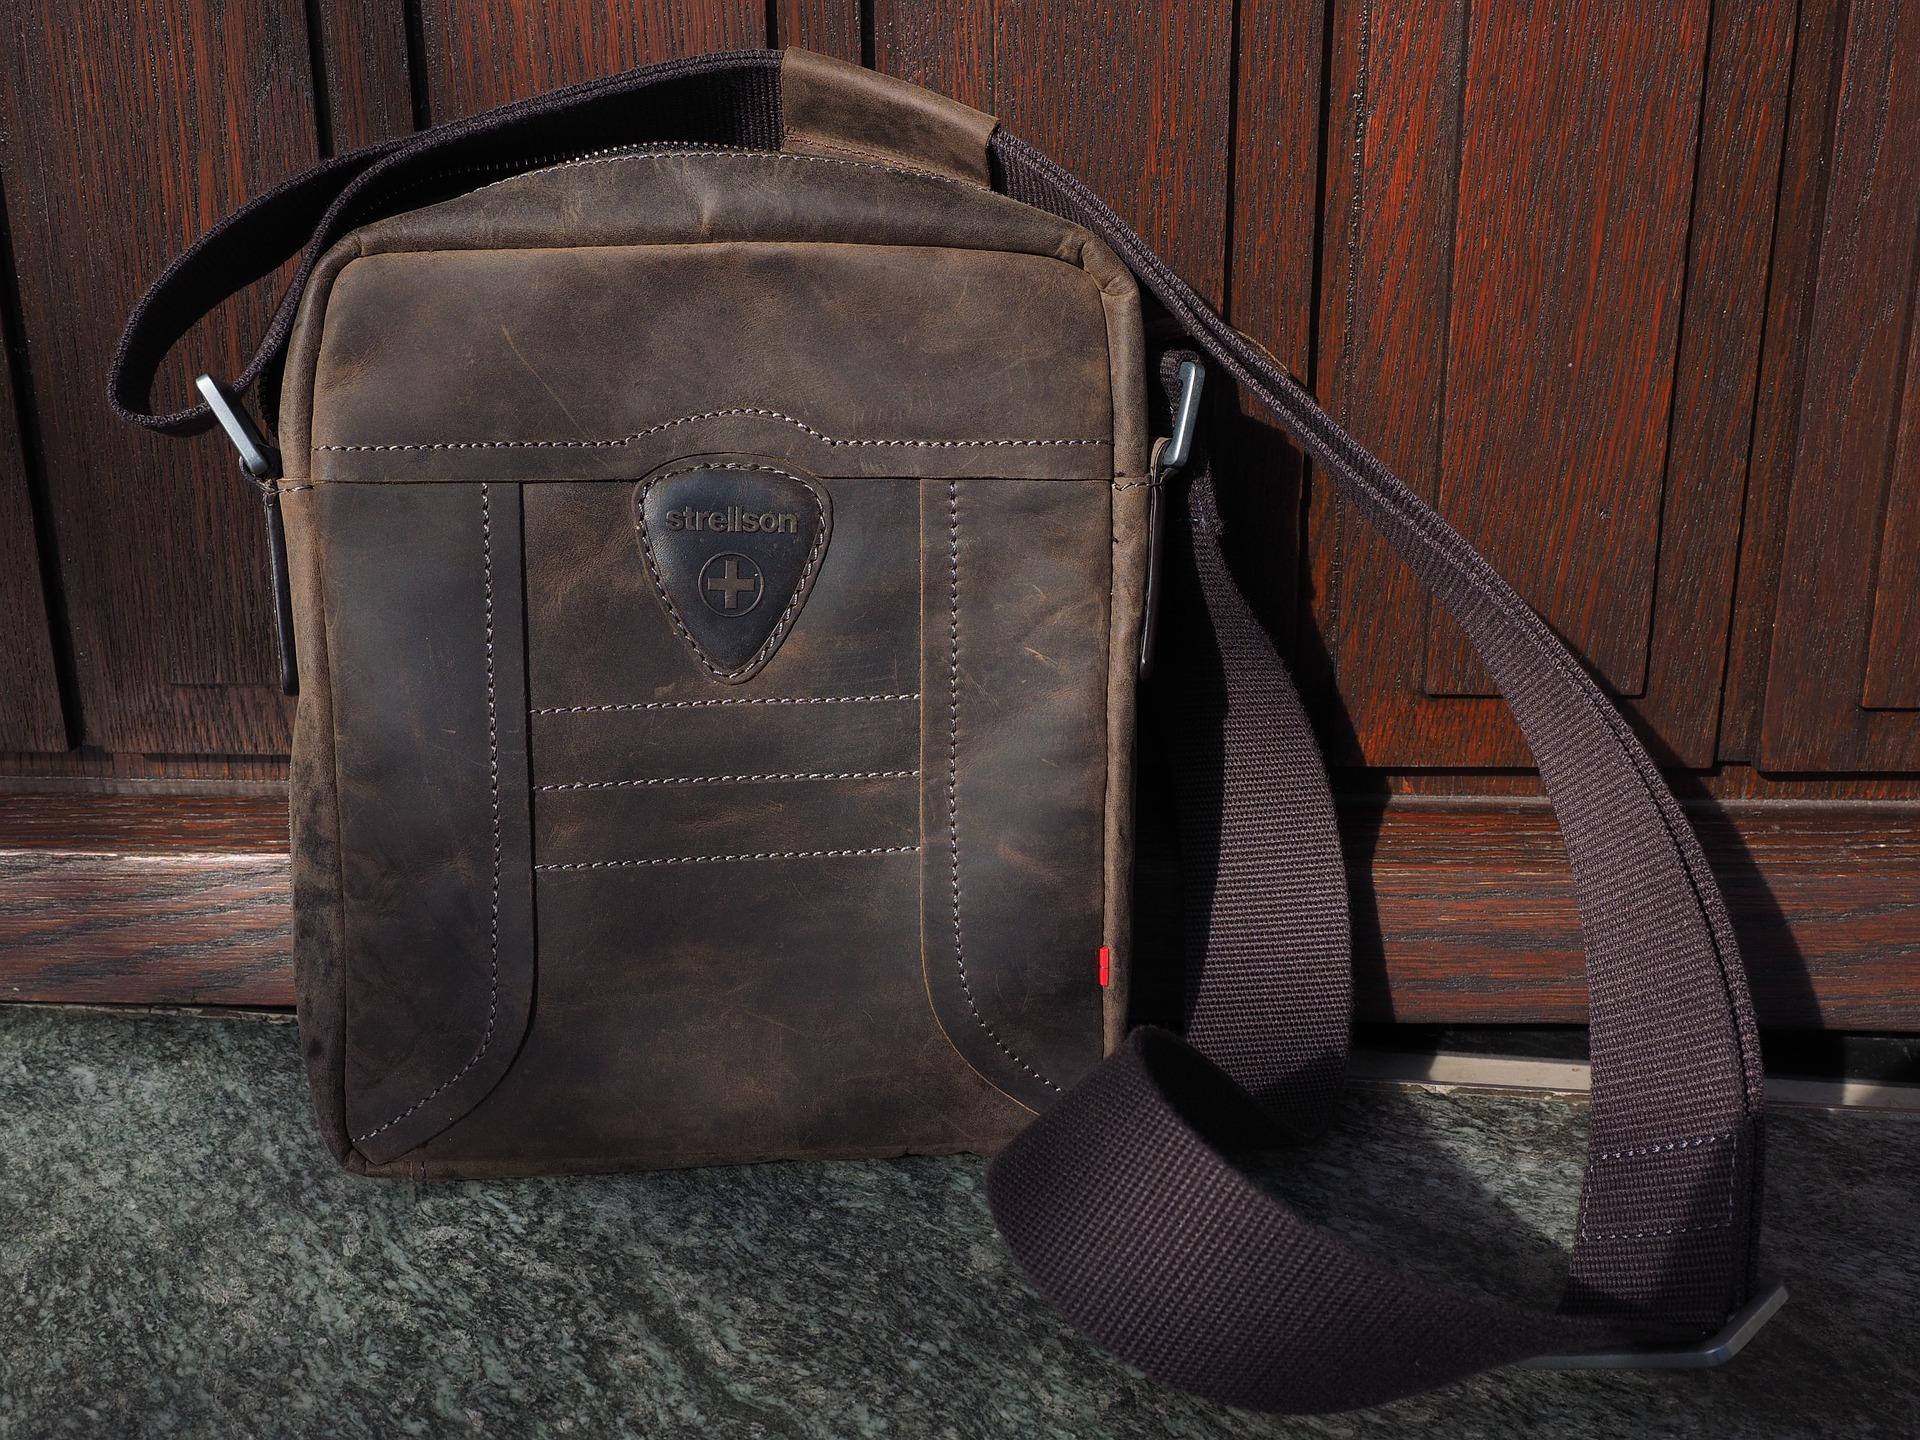 bag-767346_1920